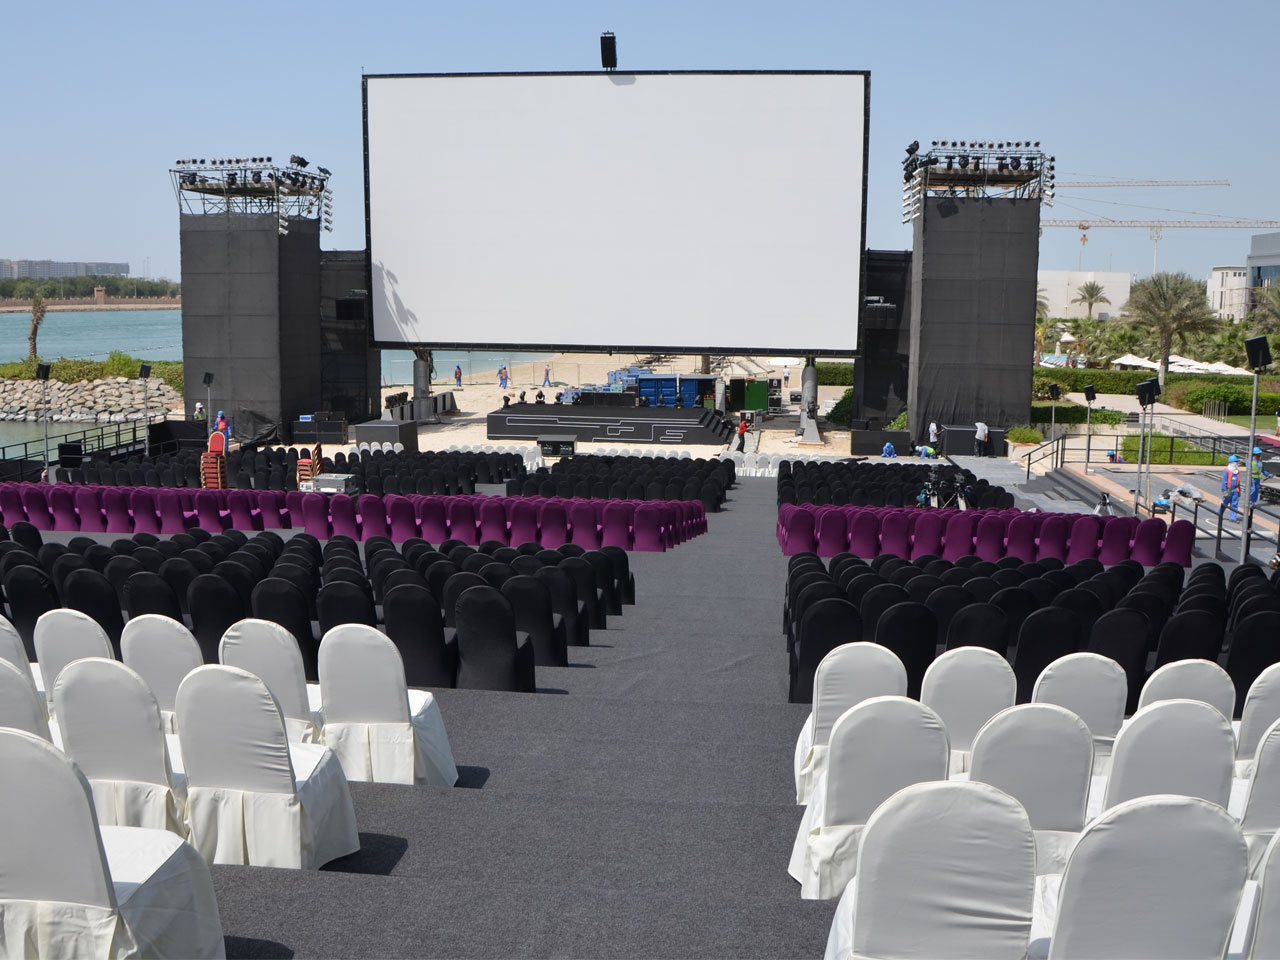 grandstand-seats-events-setup-rental-stadium-seating-sport-management-film-festival-seating-screening-f1-open-air-cinema-32